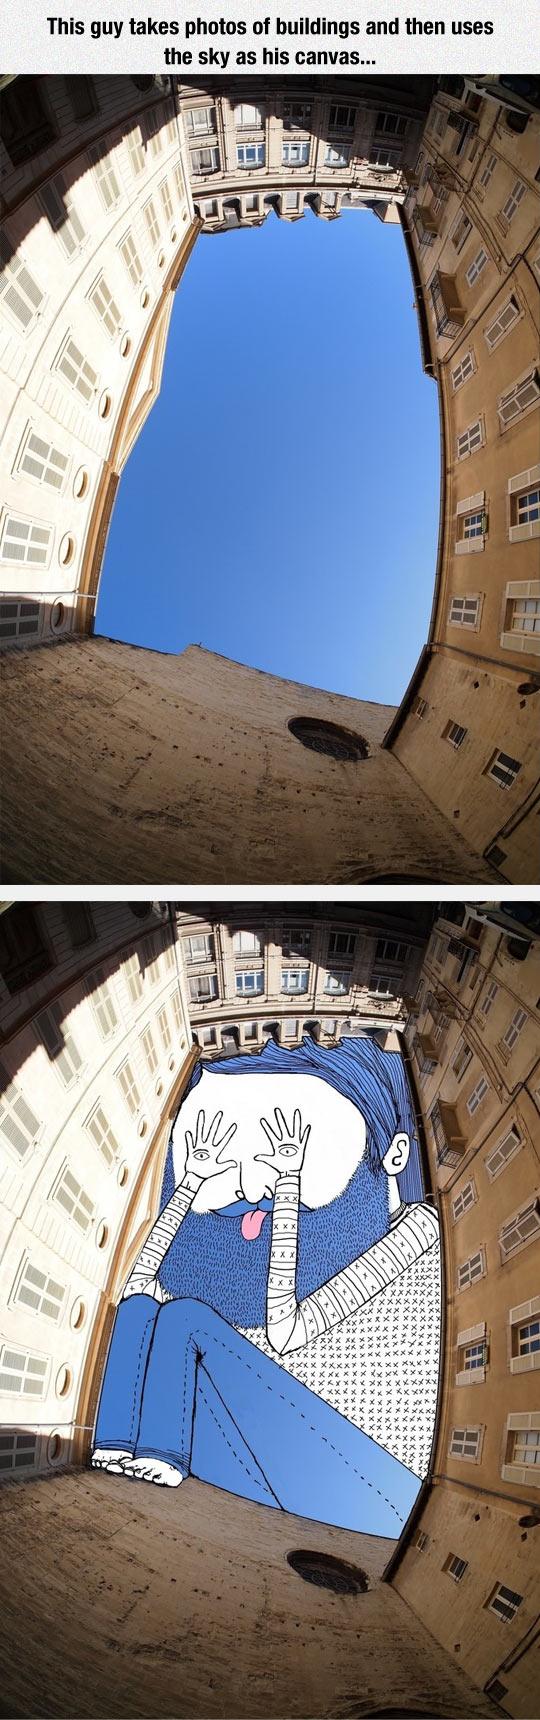 cool-building-sky-canvas-photo